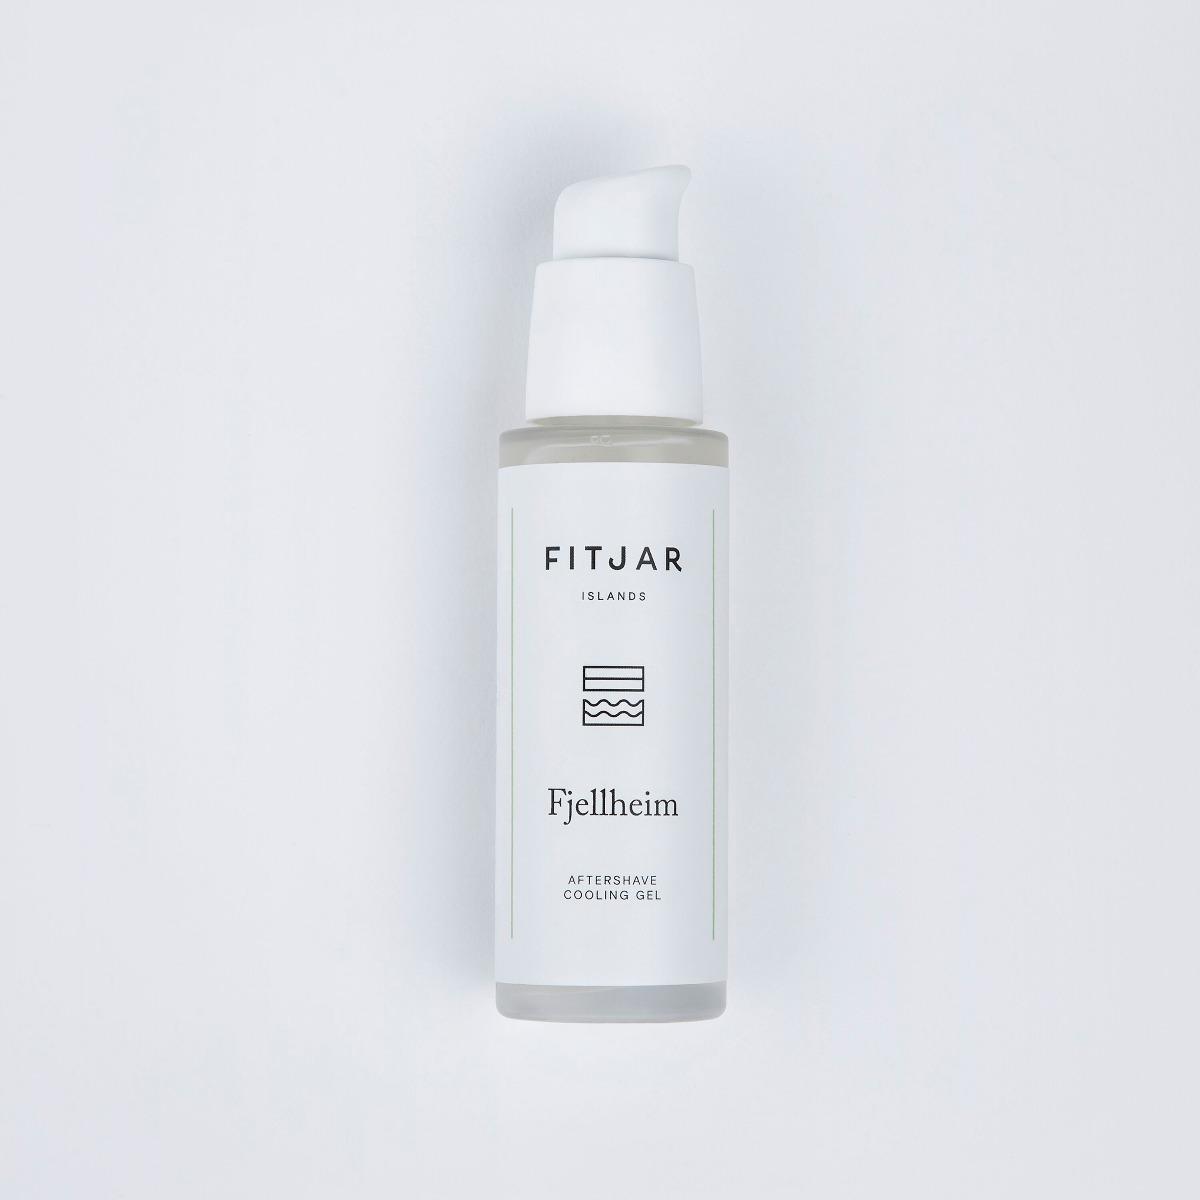 Fitjar Islands Fjellheim Aftershave Cooling Gel 50ml